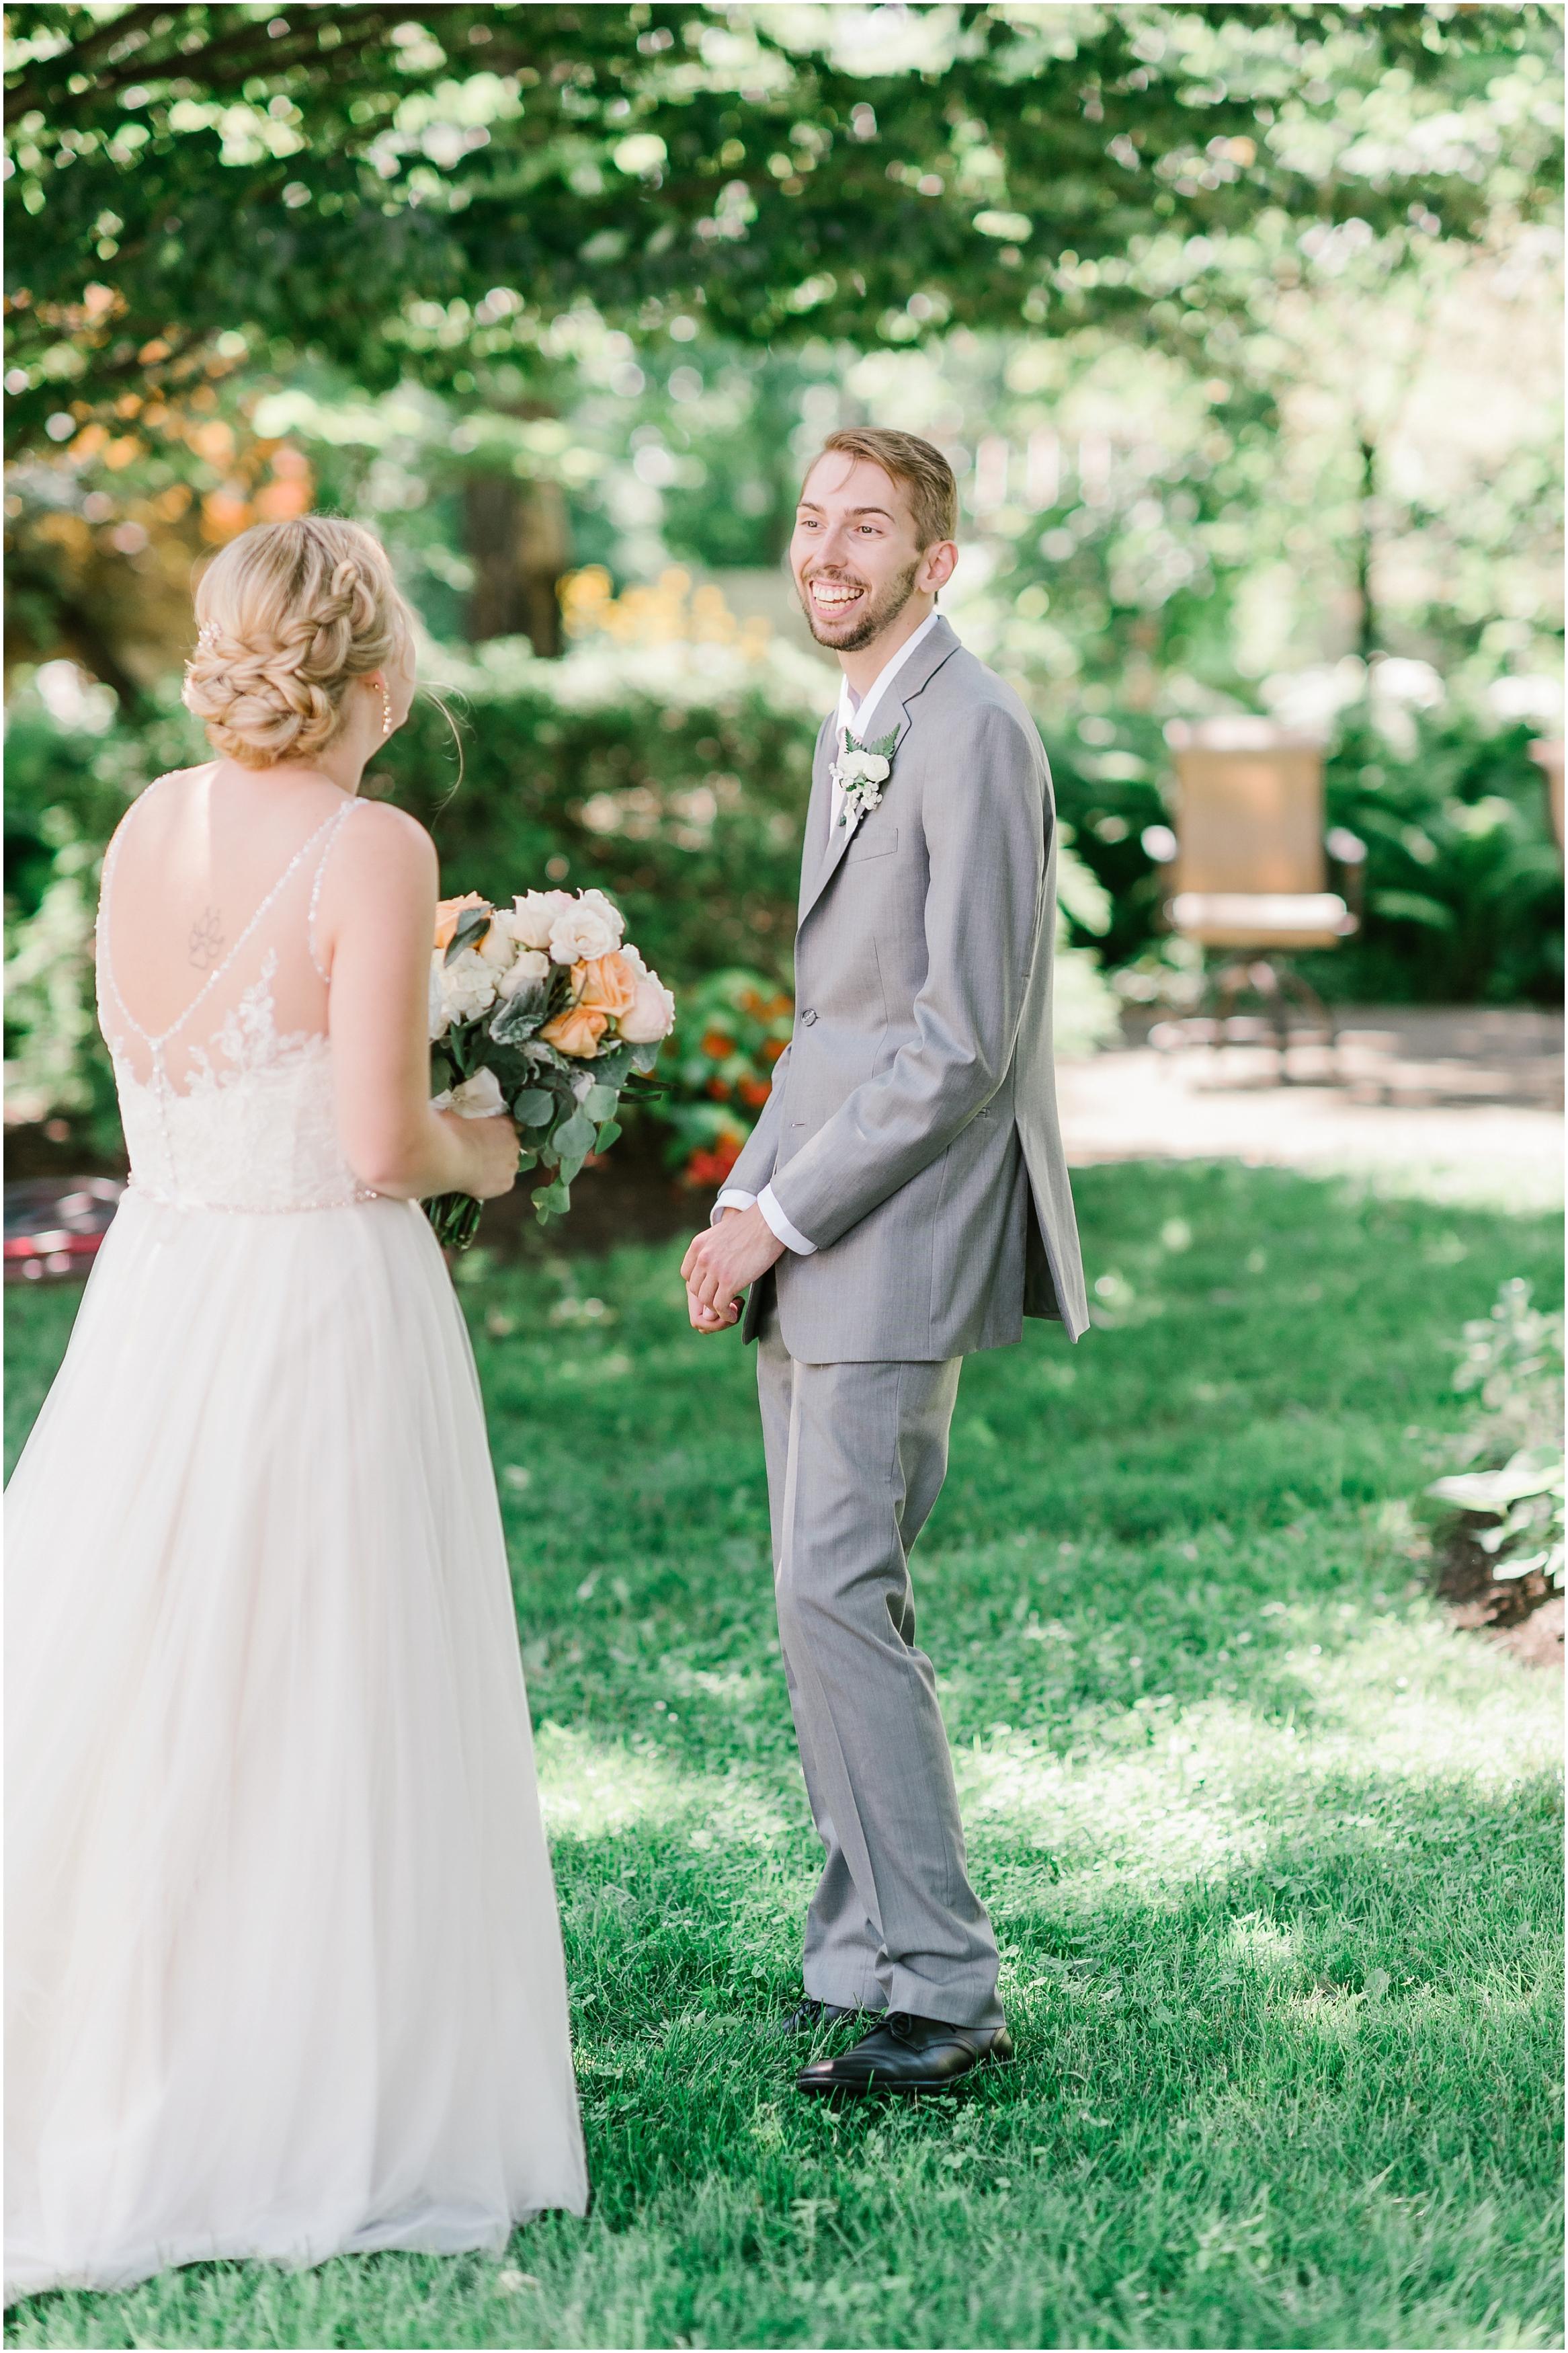 Rebecca_Shehorn_Photography_Indianapolis_Wedding_Photographer_8485.jpg